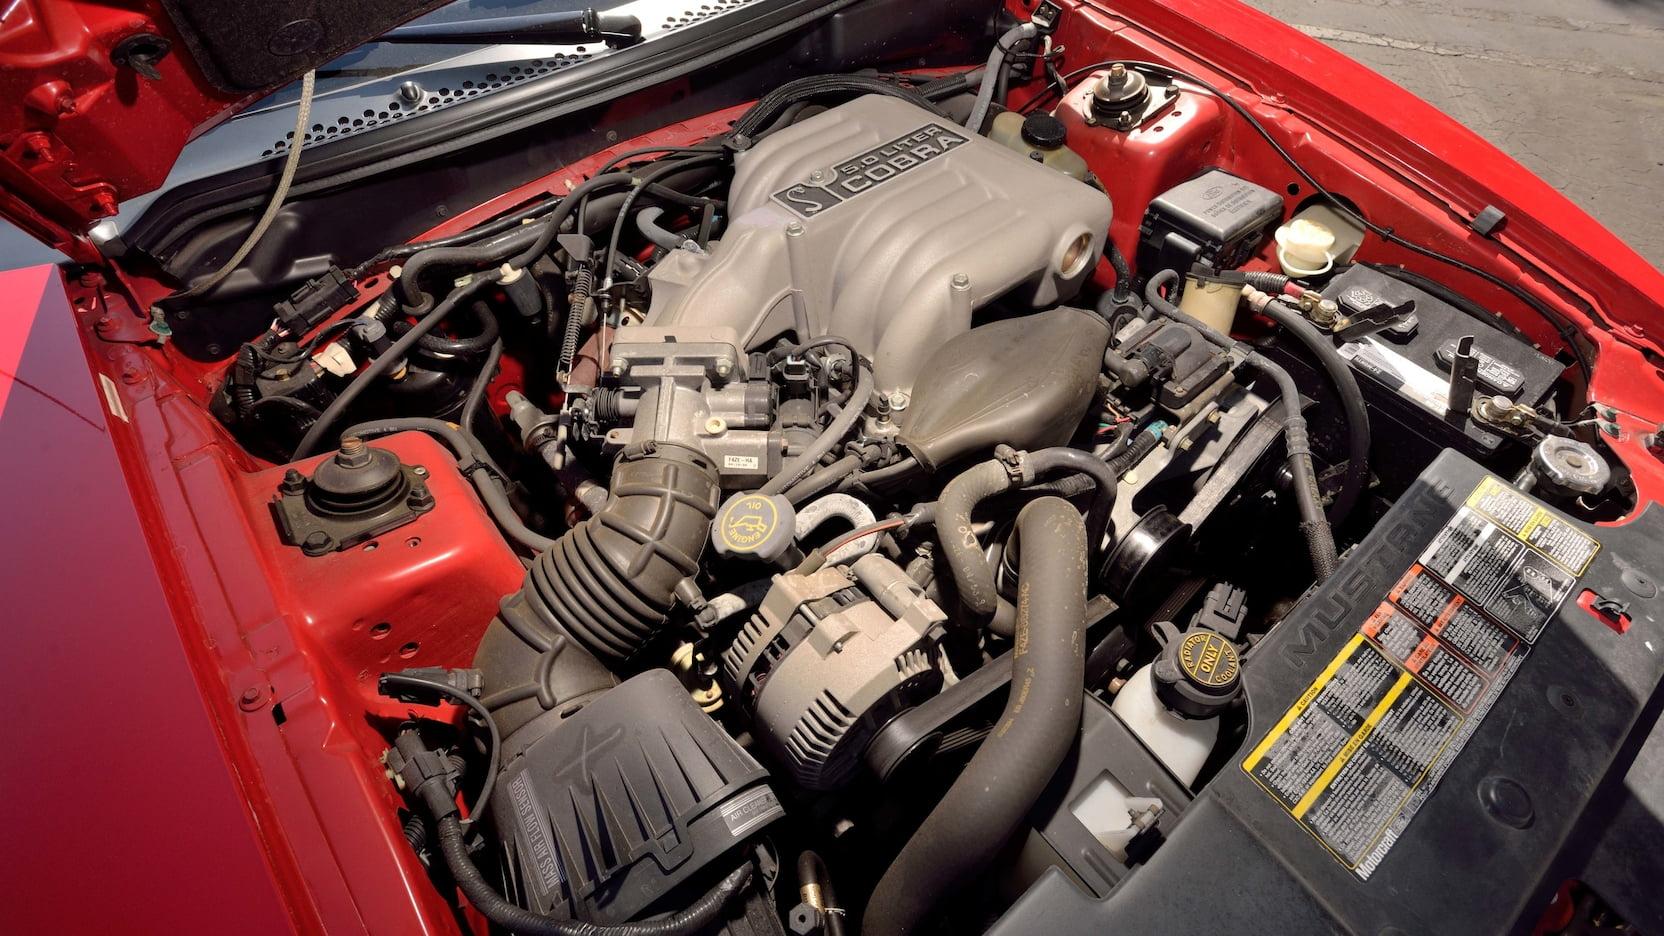 1994 Ford Mustang SVT Cobra Pace Car Edition engine Parnelli Jones Mecum